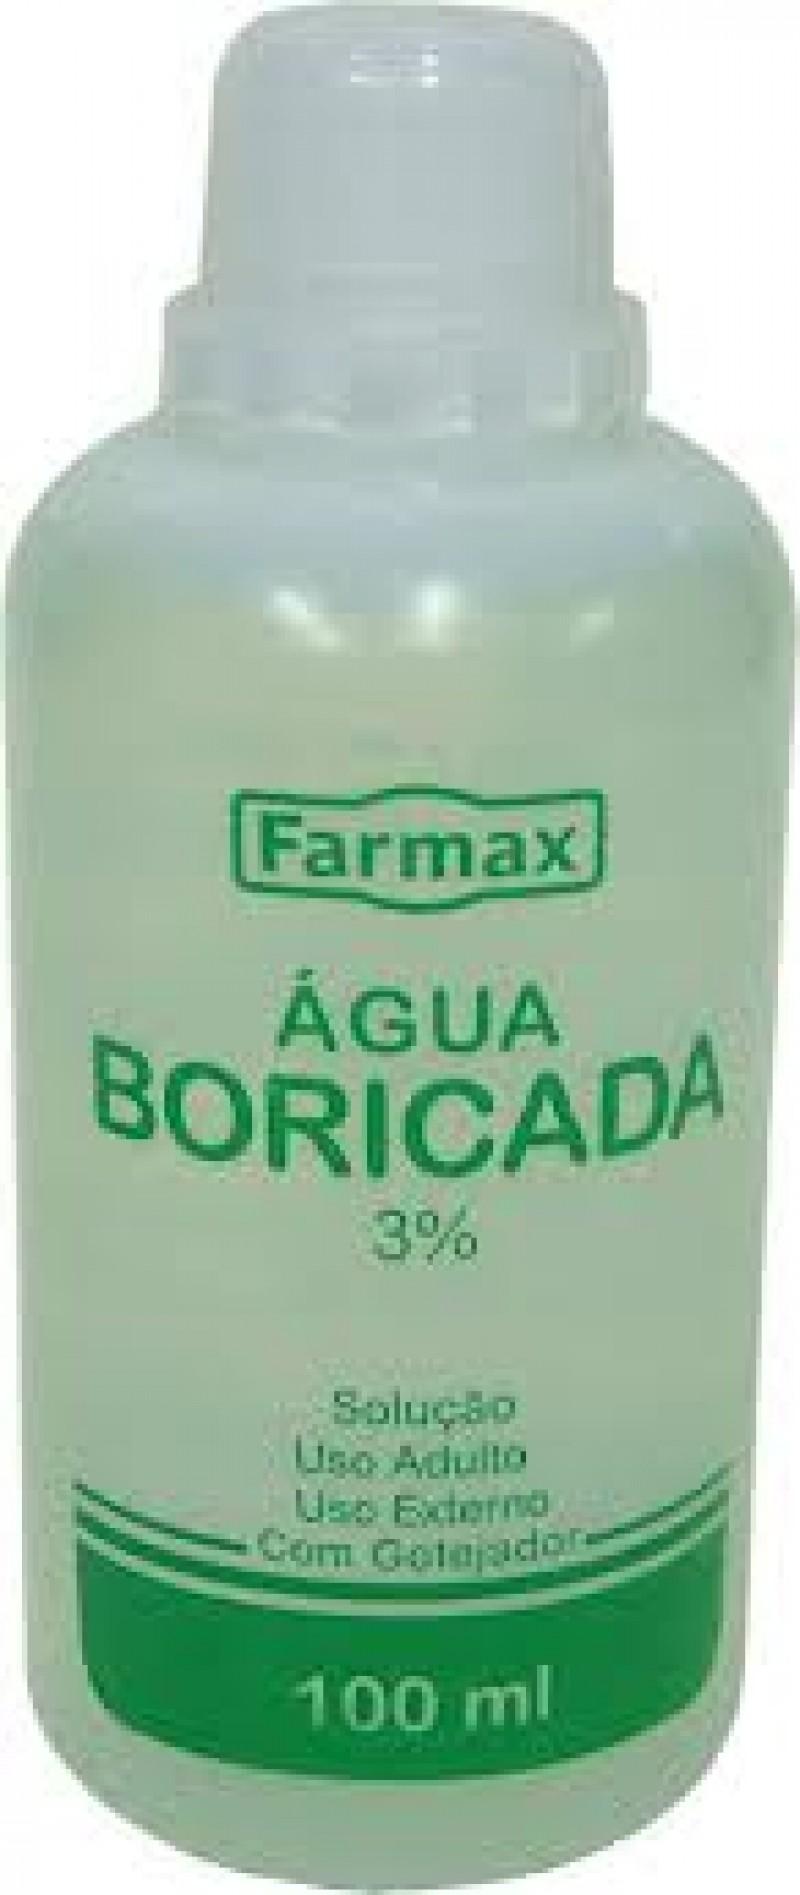 Foto 1 - Água Boricada com Gotejador Farmax 100ml